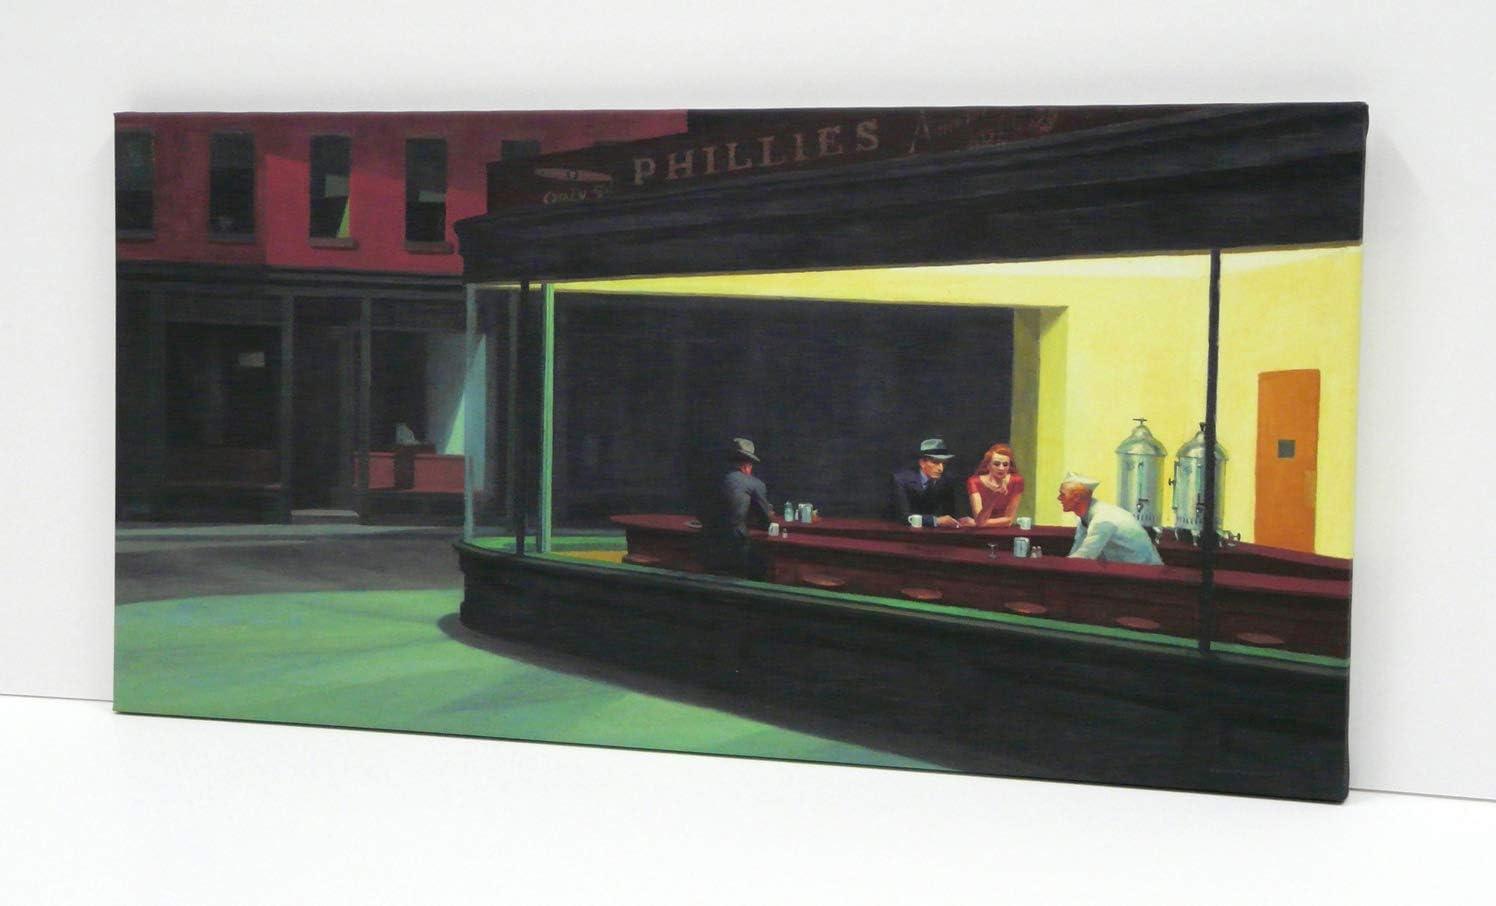 Lienzo Cuadro Nighthawks, Edward Hopper 1942, (P2678) Impreso en Canvas de 320 gr de Algodón- Acabado Mate- Bastidor de Madera de Pino de 2cm de Grosor-Muy Ligero (40x80cm)